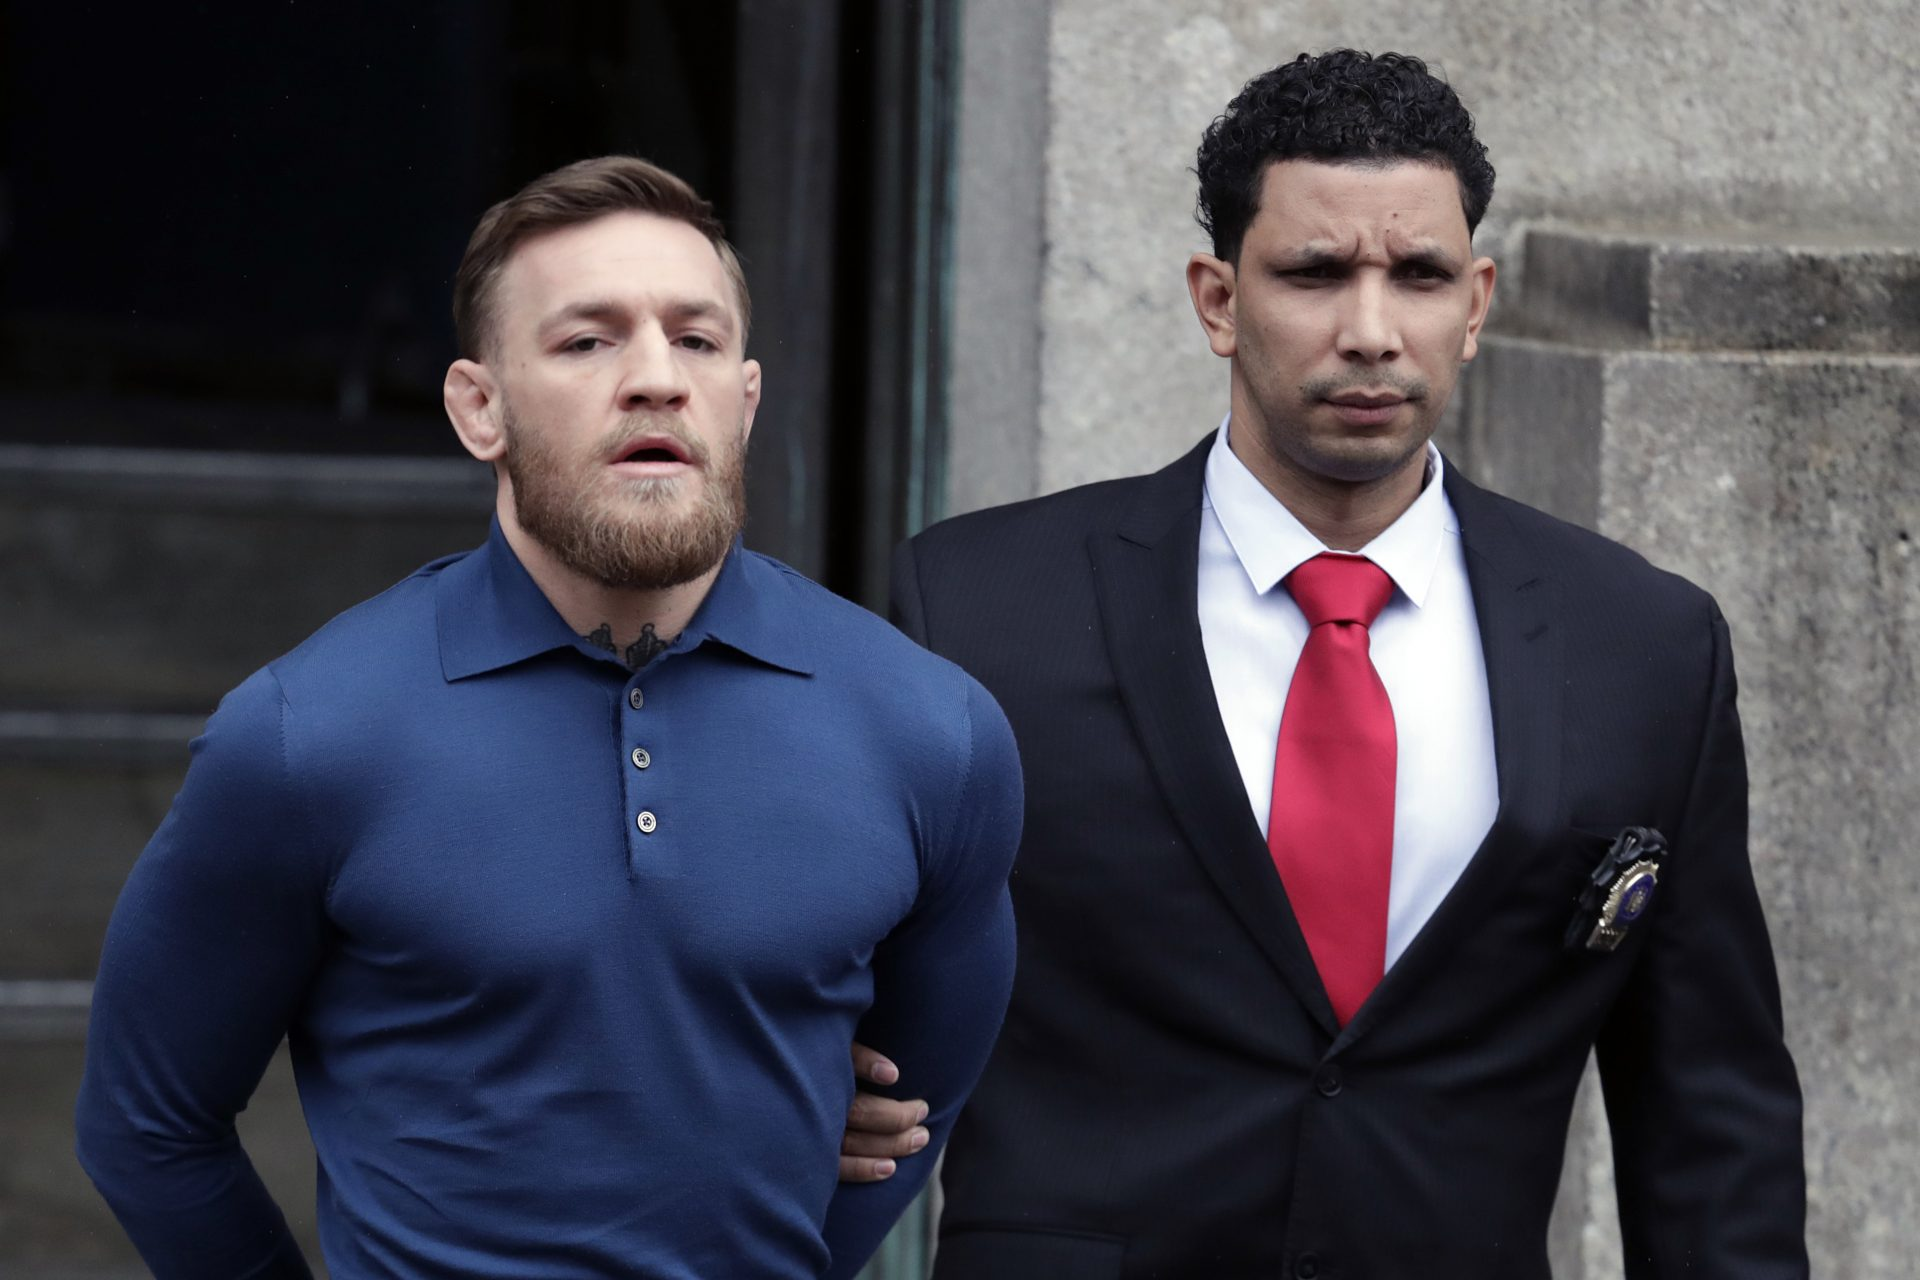 French authorities drop sexual assault investigation of Conor McGregor